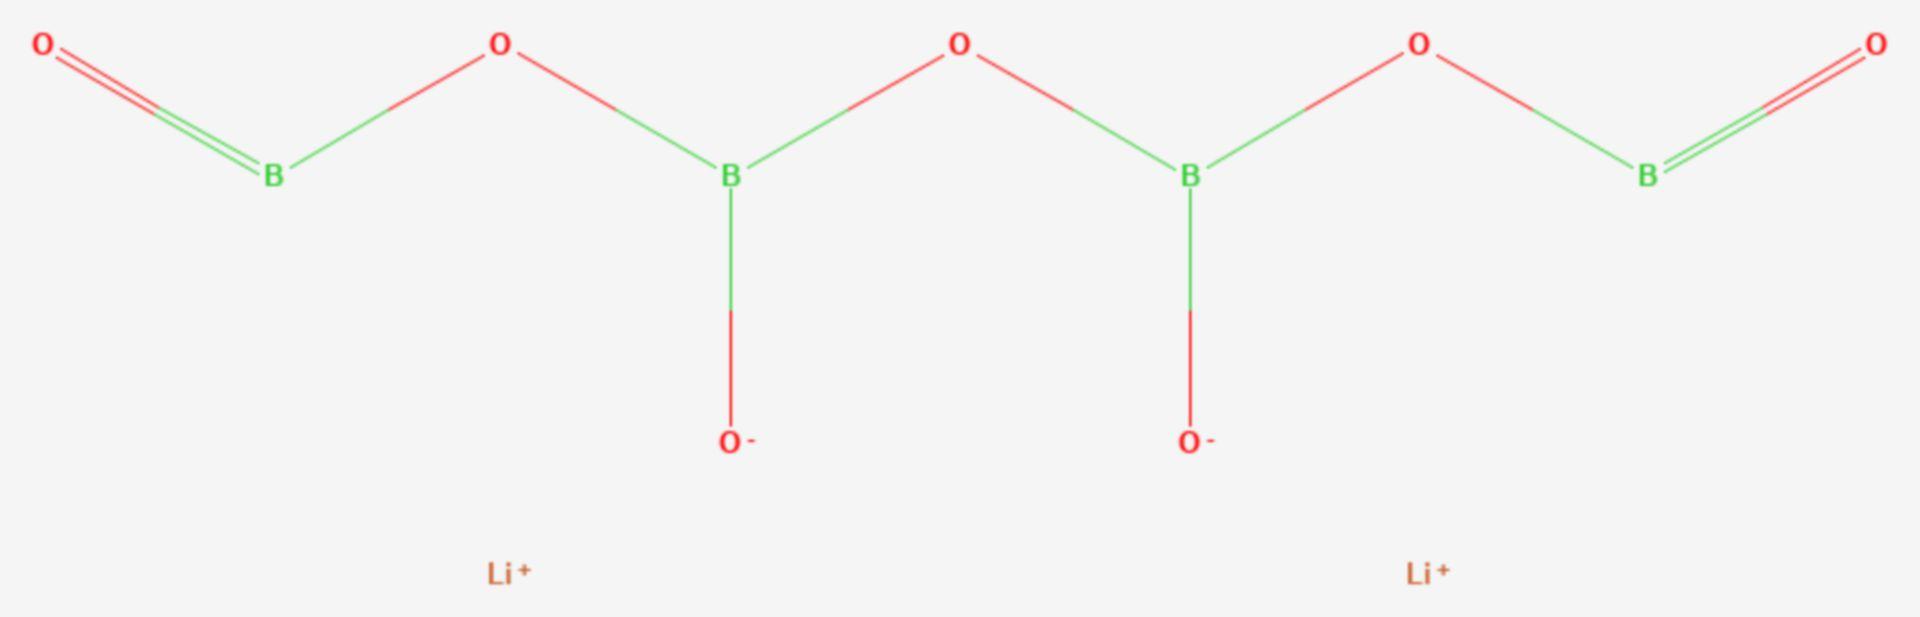 Lithiumtetraborat (Strukturformel)